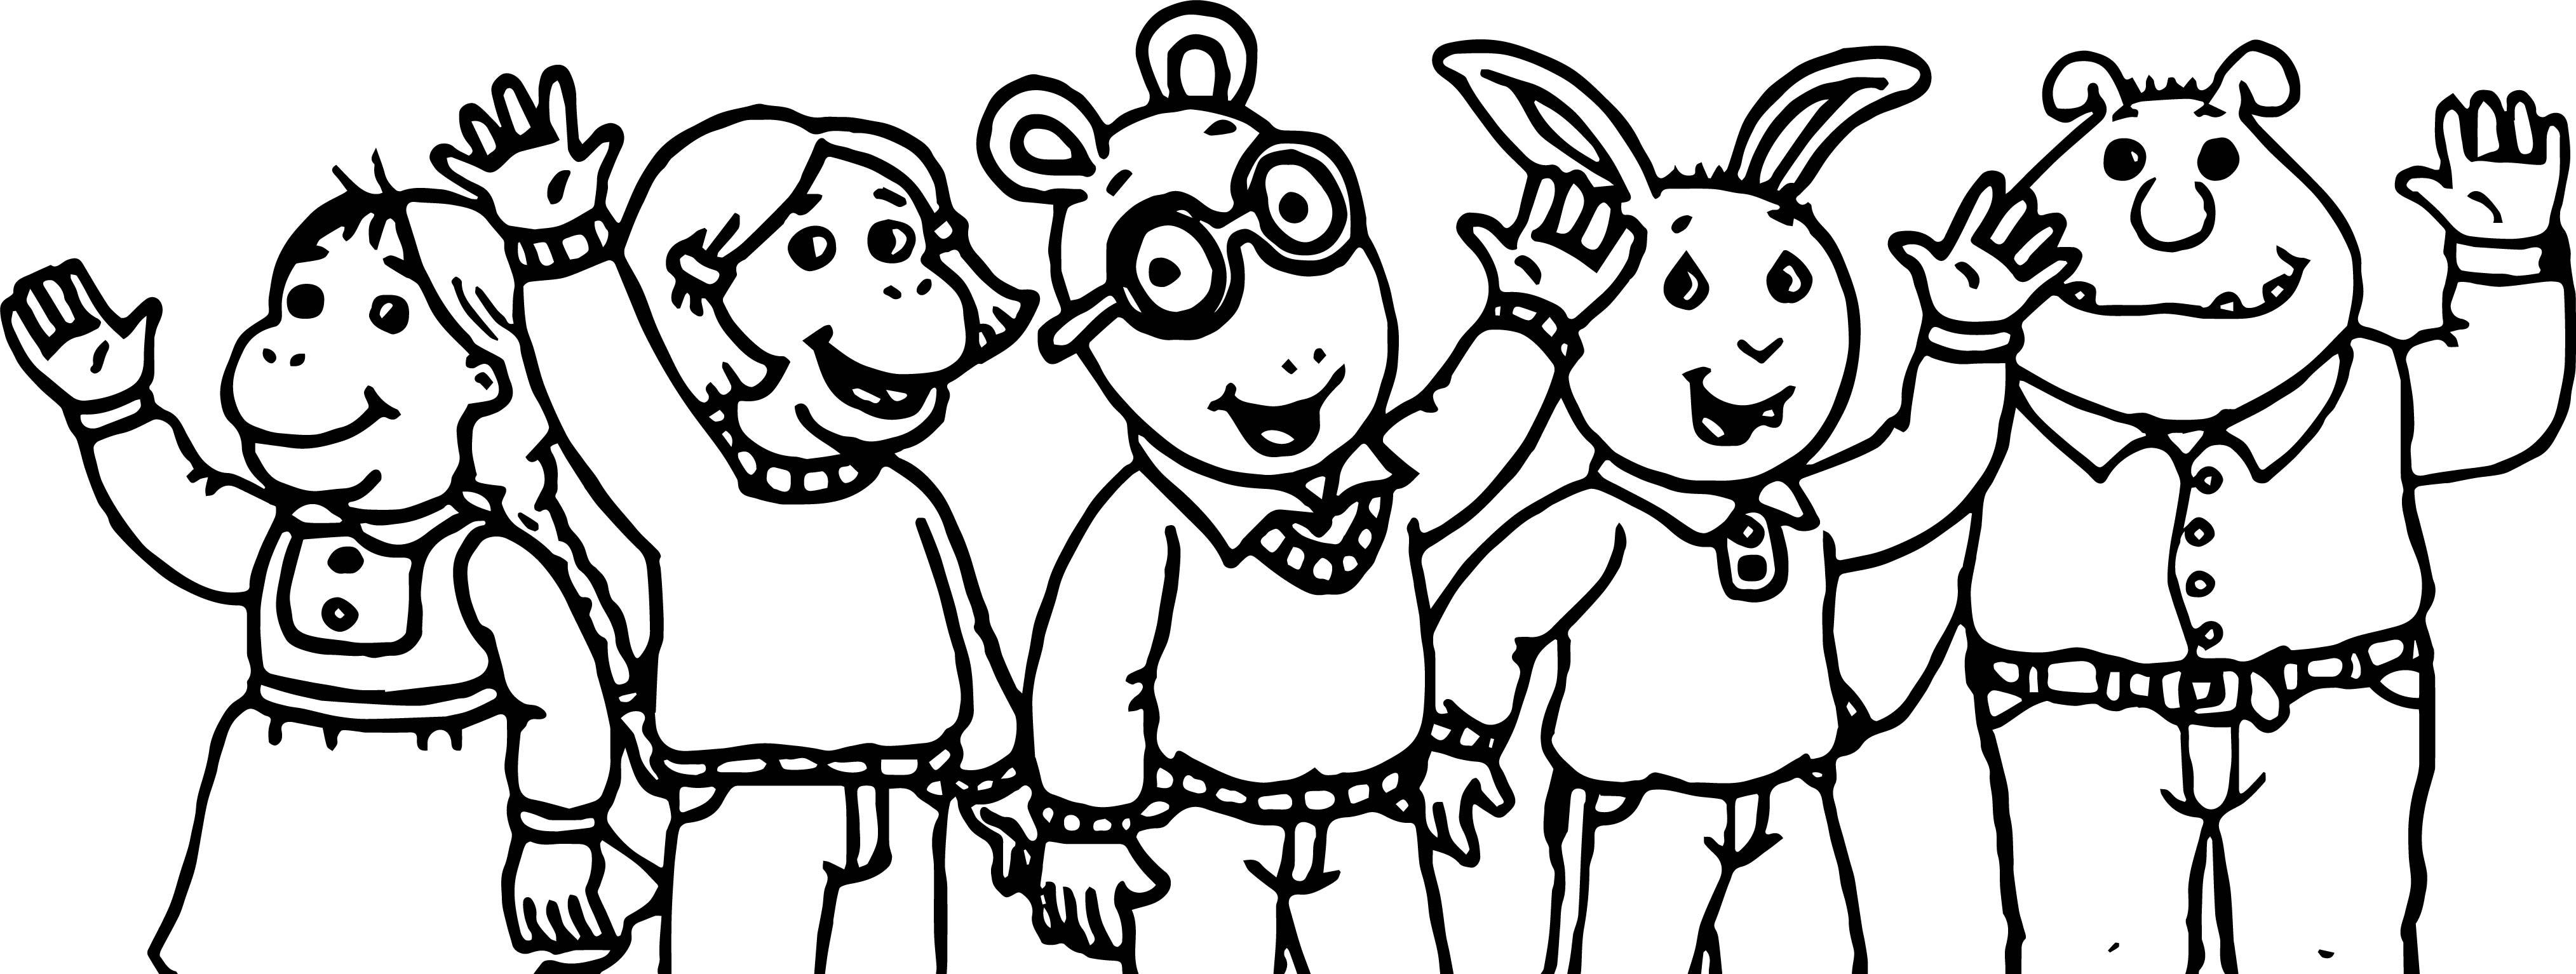 Arthur Friends Hello Coloring Page